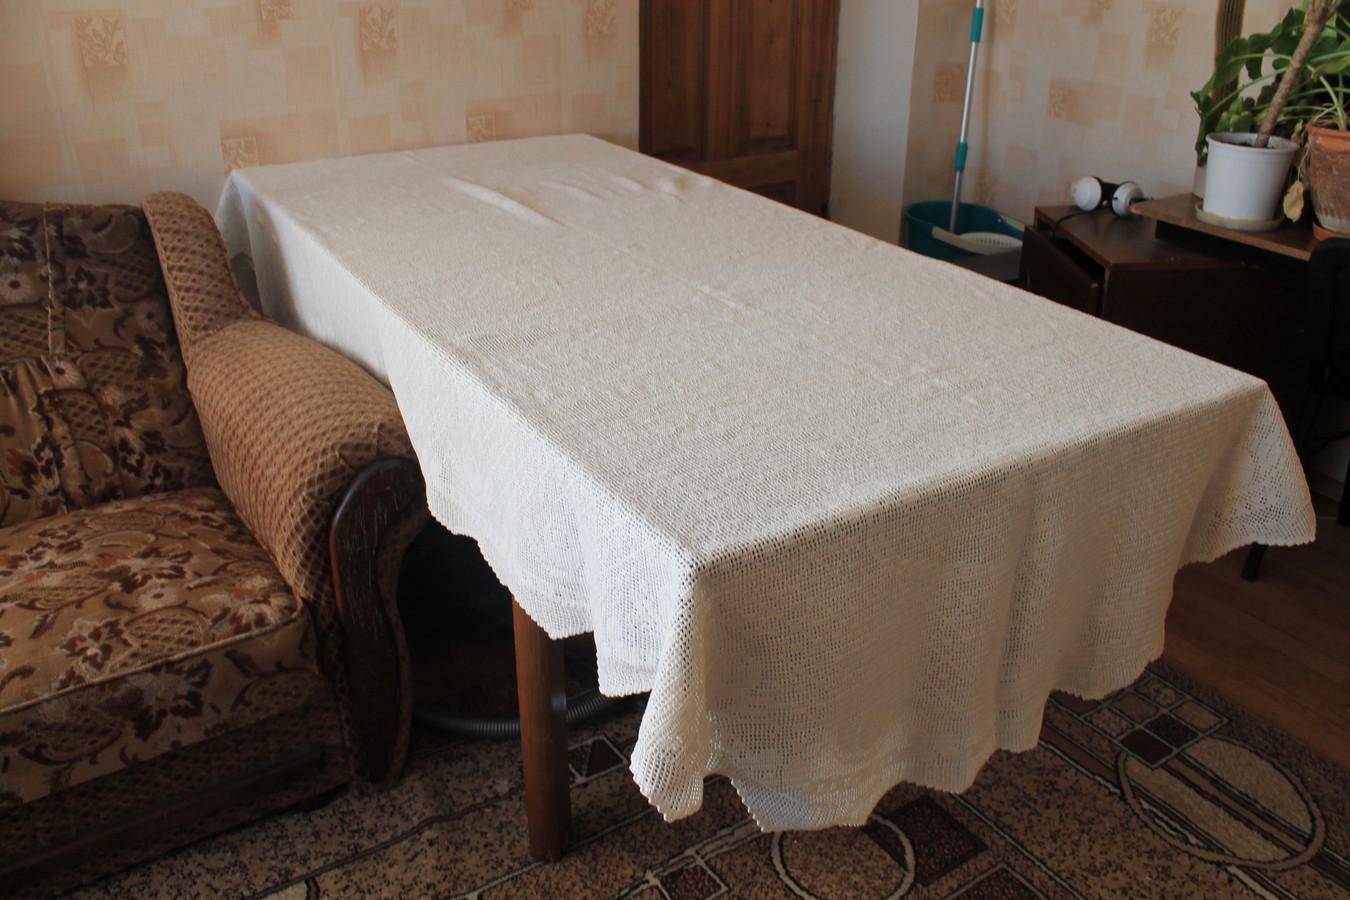 Nerta staltiesė